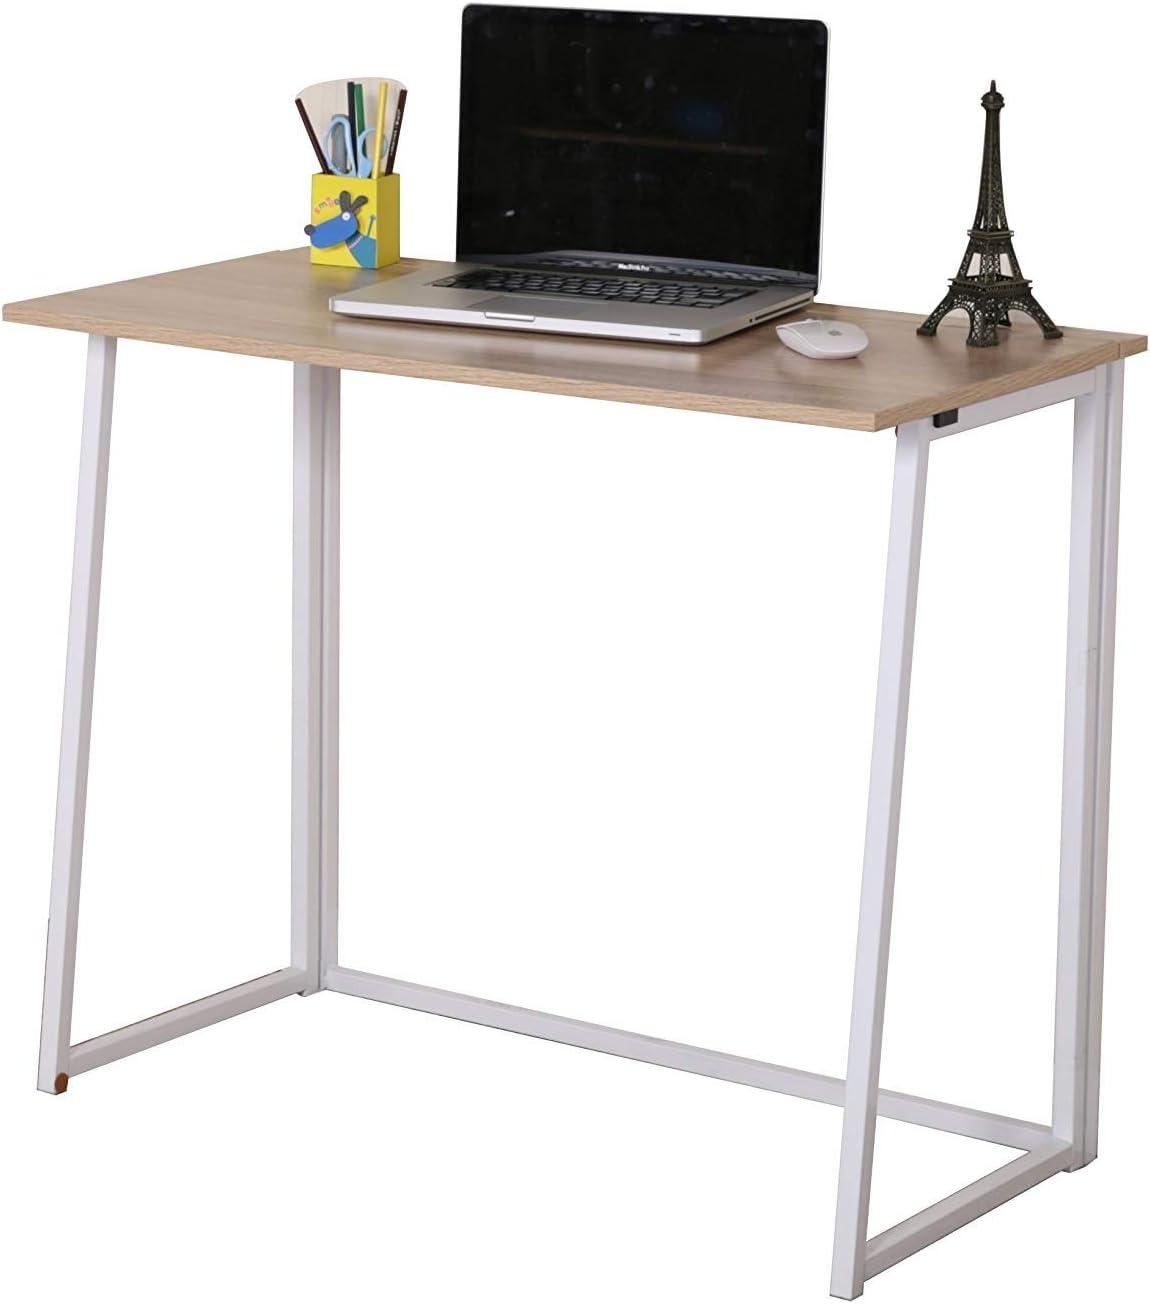 LYF Mueble Compacto Plegable para computadora, Escritorio para computadora portátil (Negro): Amazon.es: Productos para mascotas